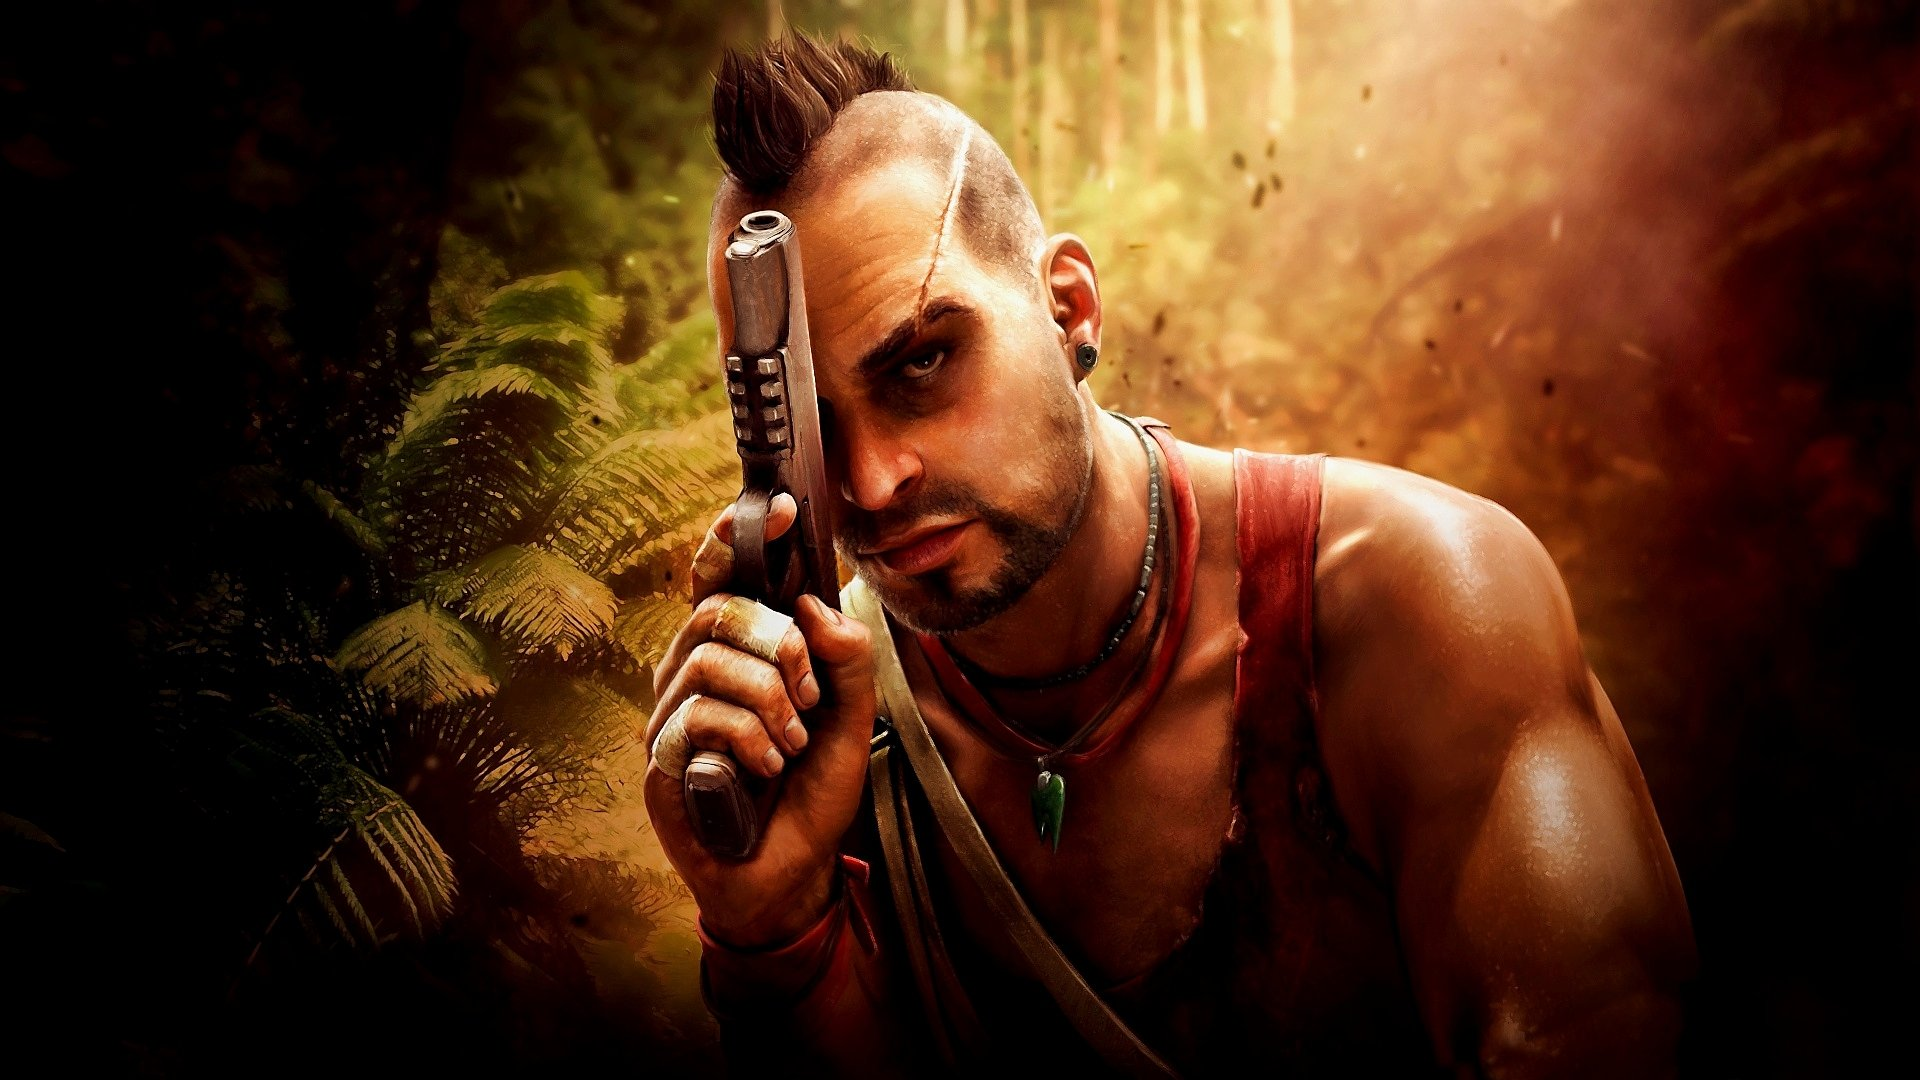 Актер из Far Cry 3 намекнул навозвращение вновой части самого яркого антагониста серии